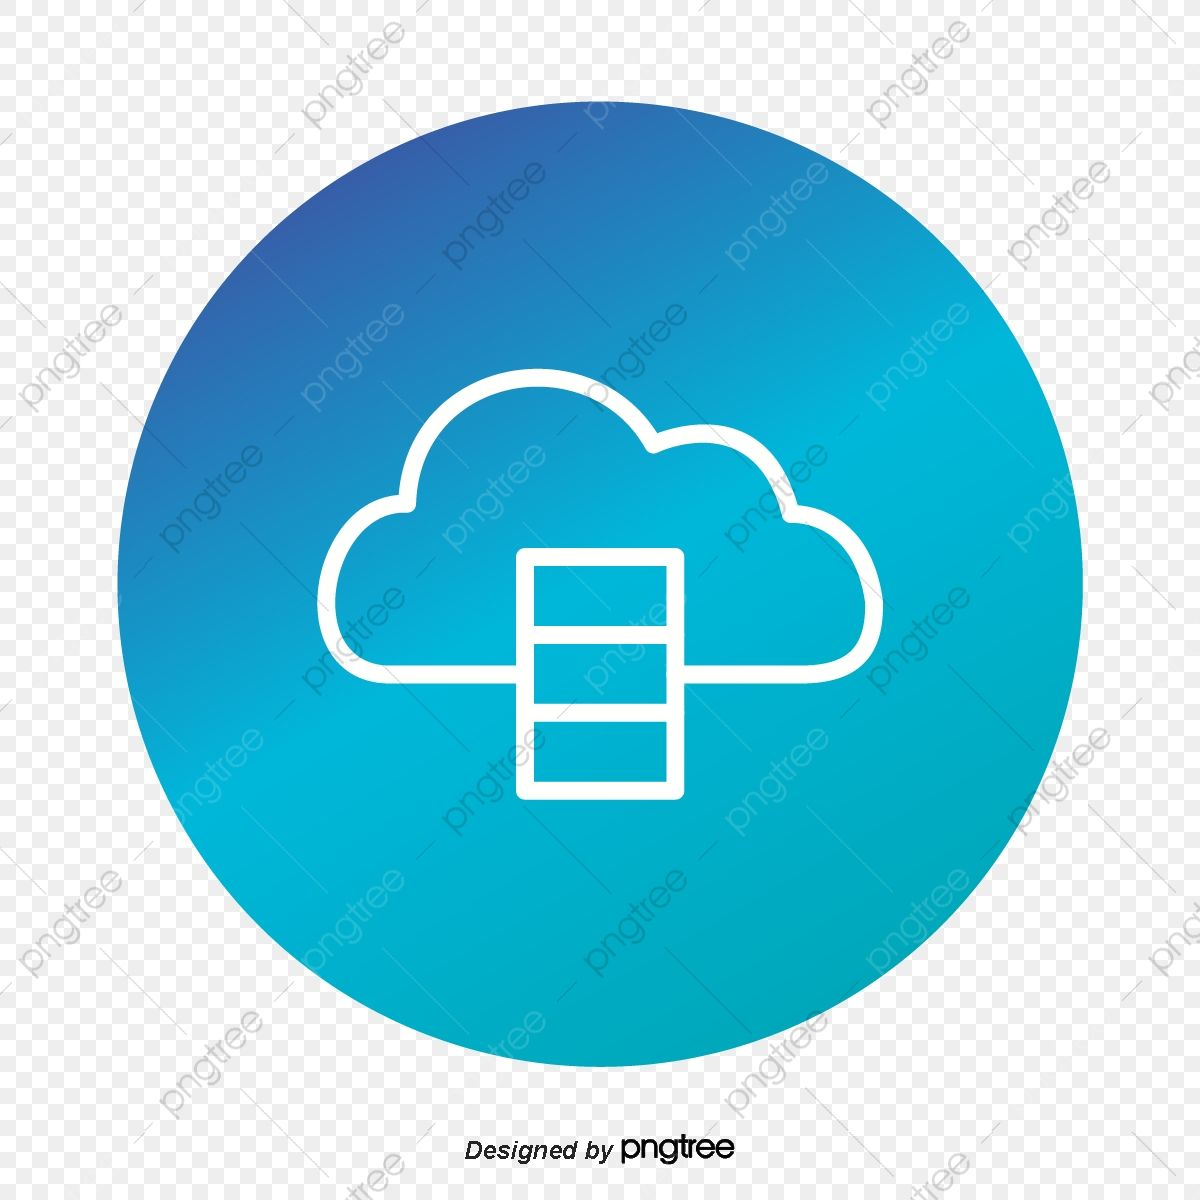 Cloud Storage Png In 2020 Cloud Storage Logo Cloud Cloud Data